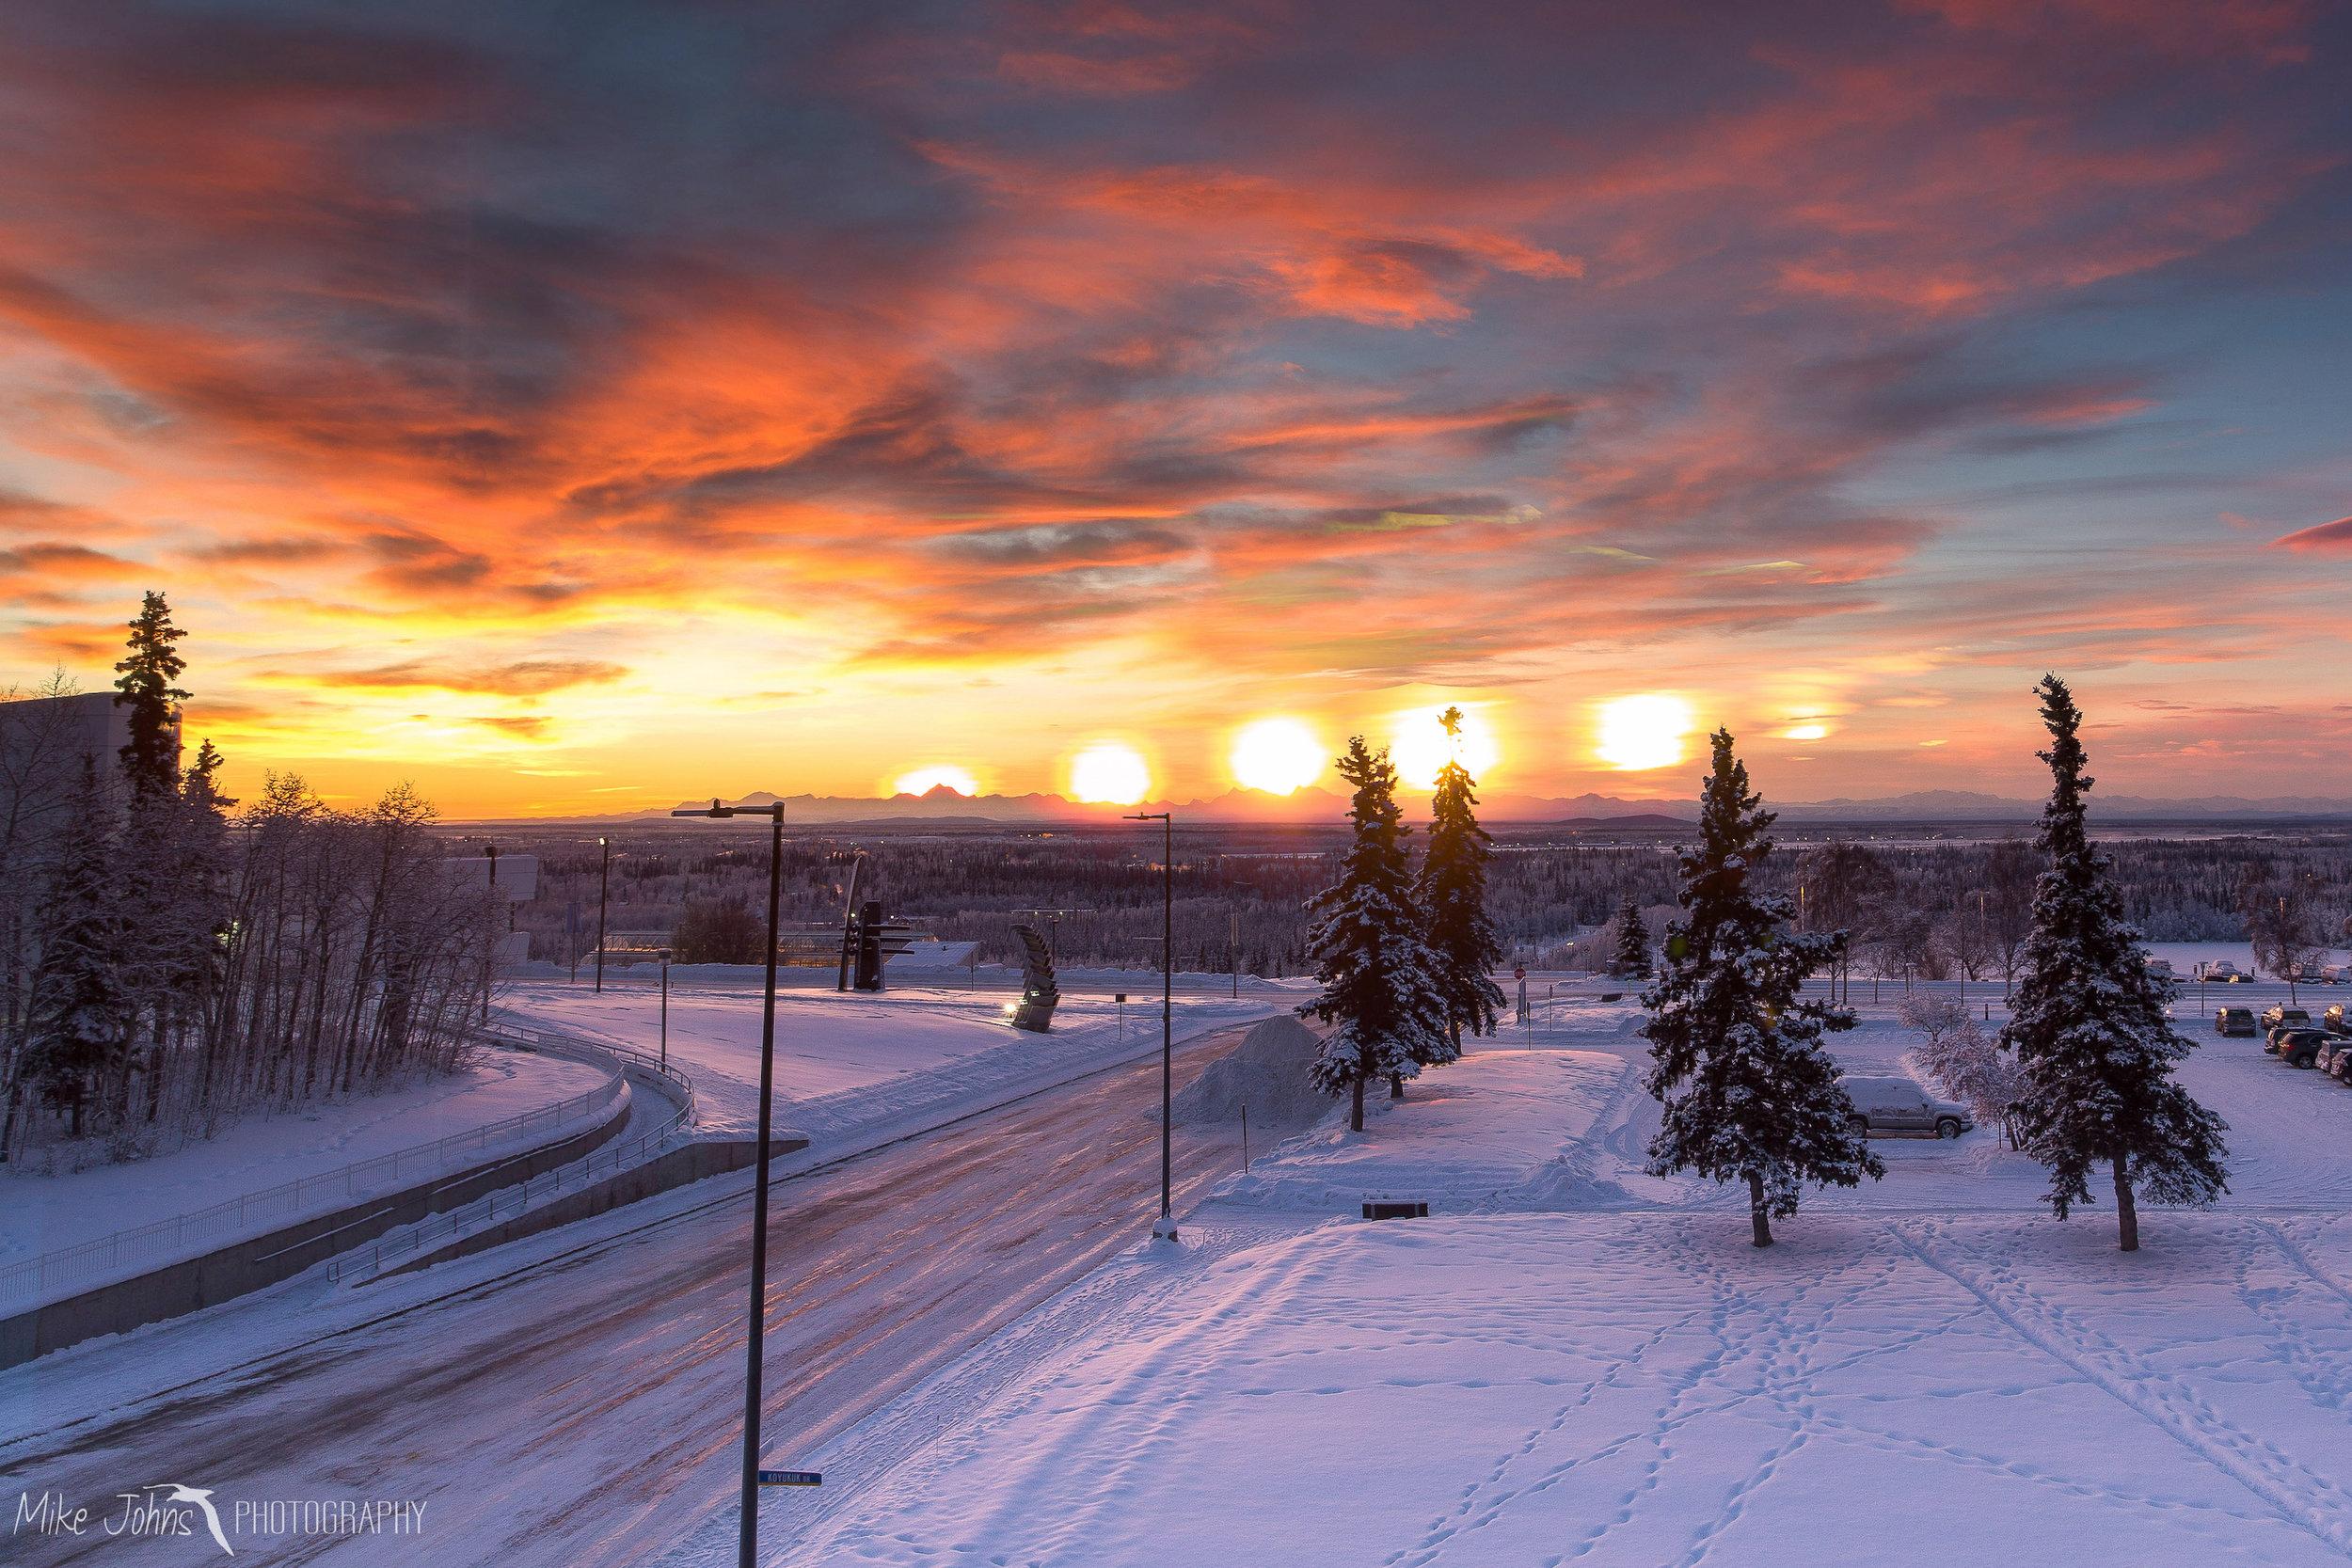 Winter Solstice Fairbanks AK